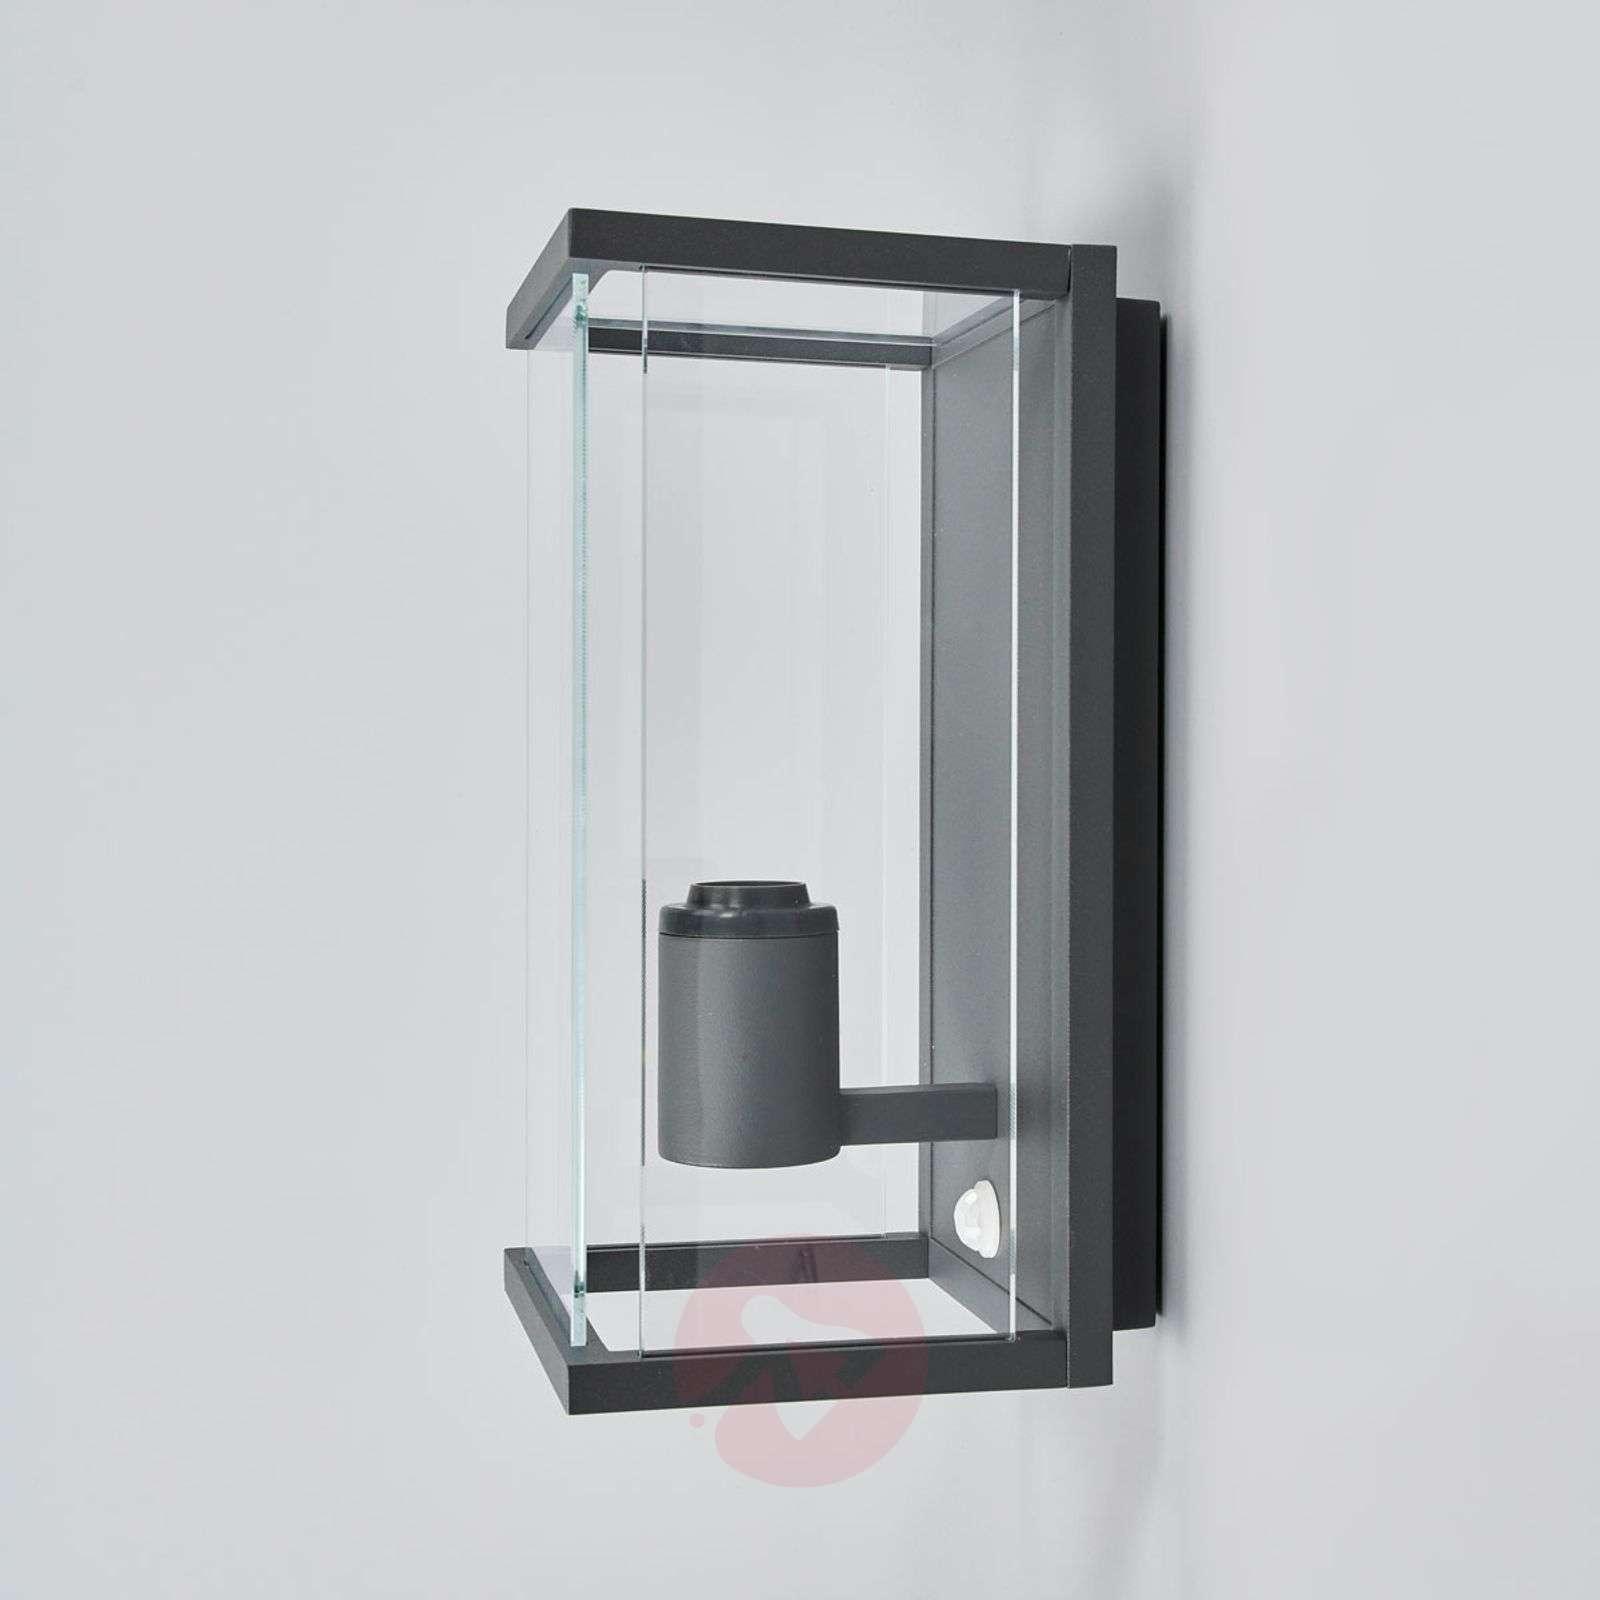 Annalea motion sensor outdoor wall lamp-9616123-01